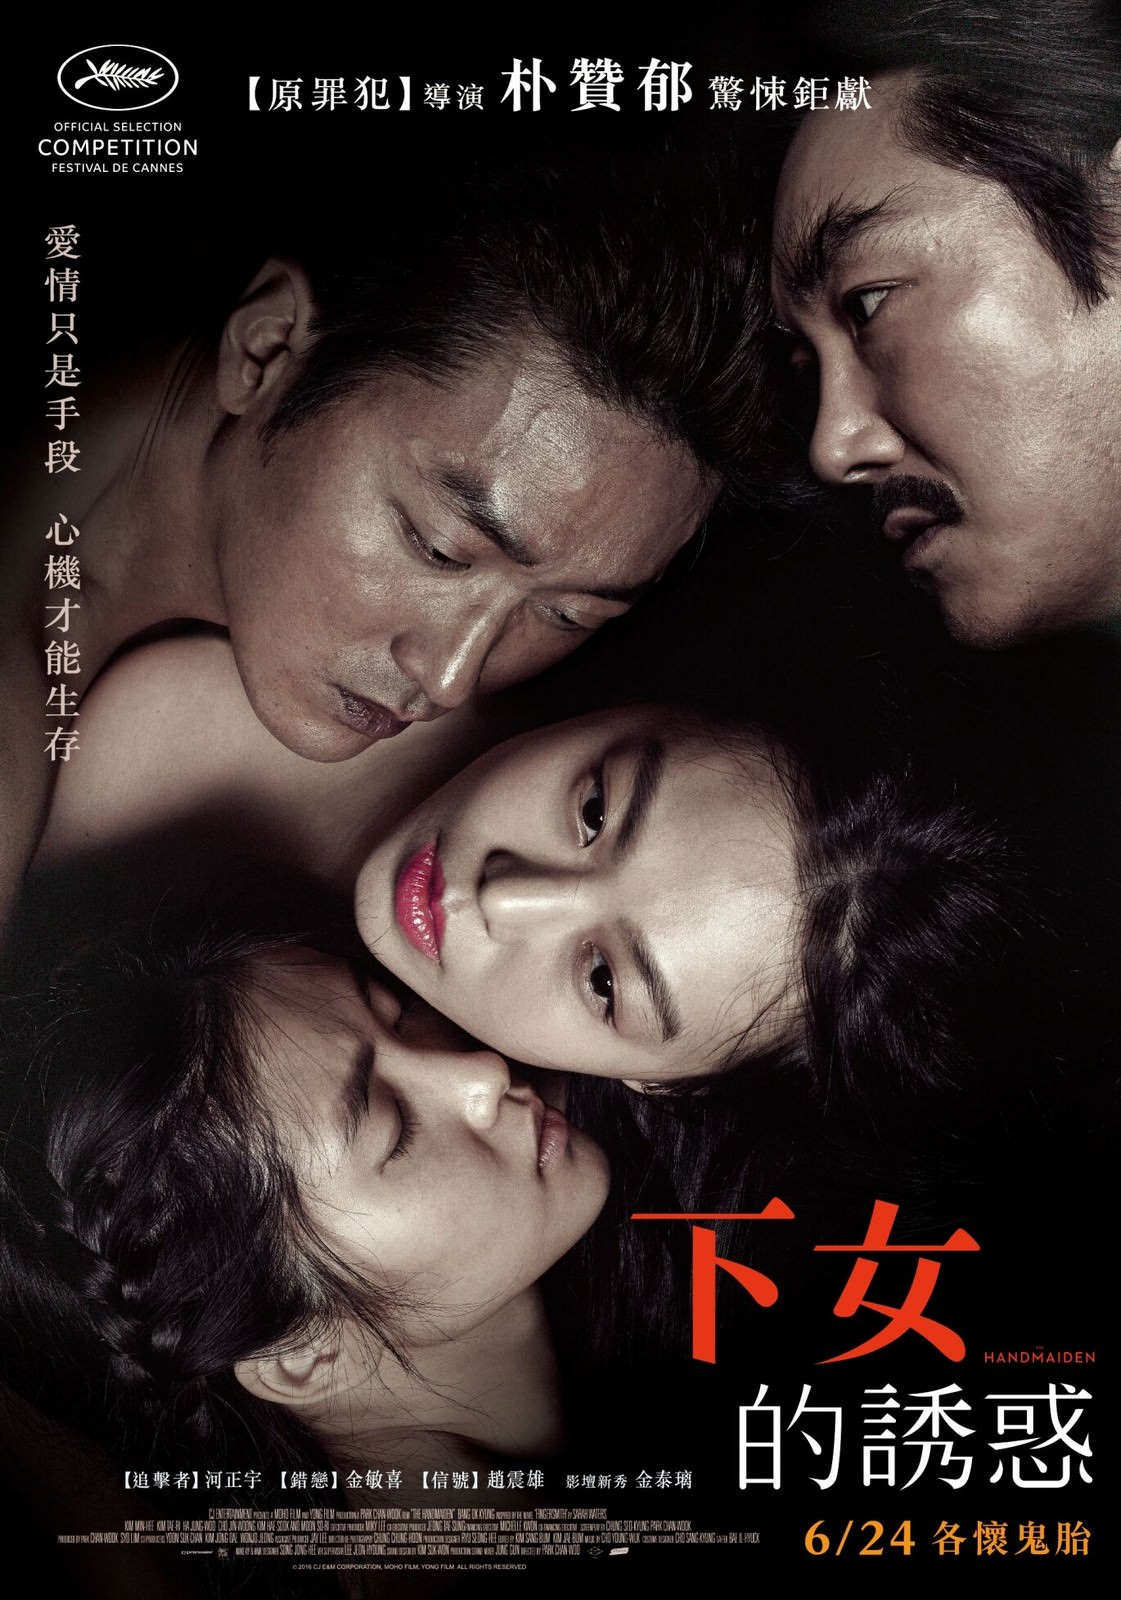 Movie, 아가씨(韓國, 2016年) / 下女的誘惑(台灣) / 下女誘罪(香港) / The Handmaiden(英文) / 小姐(網路), 電影海報, 台灣